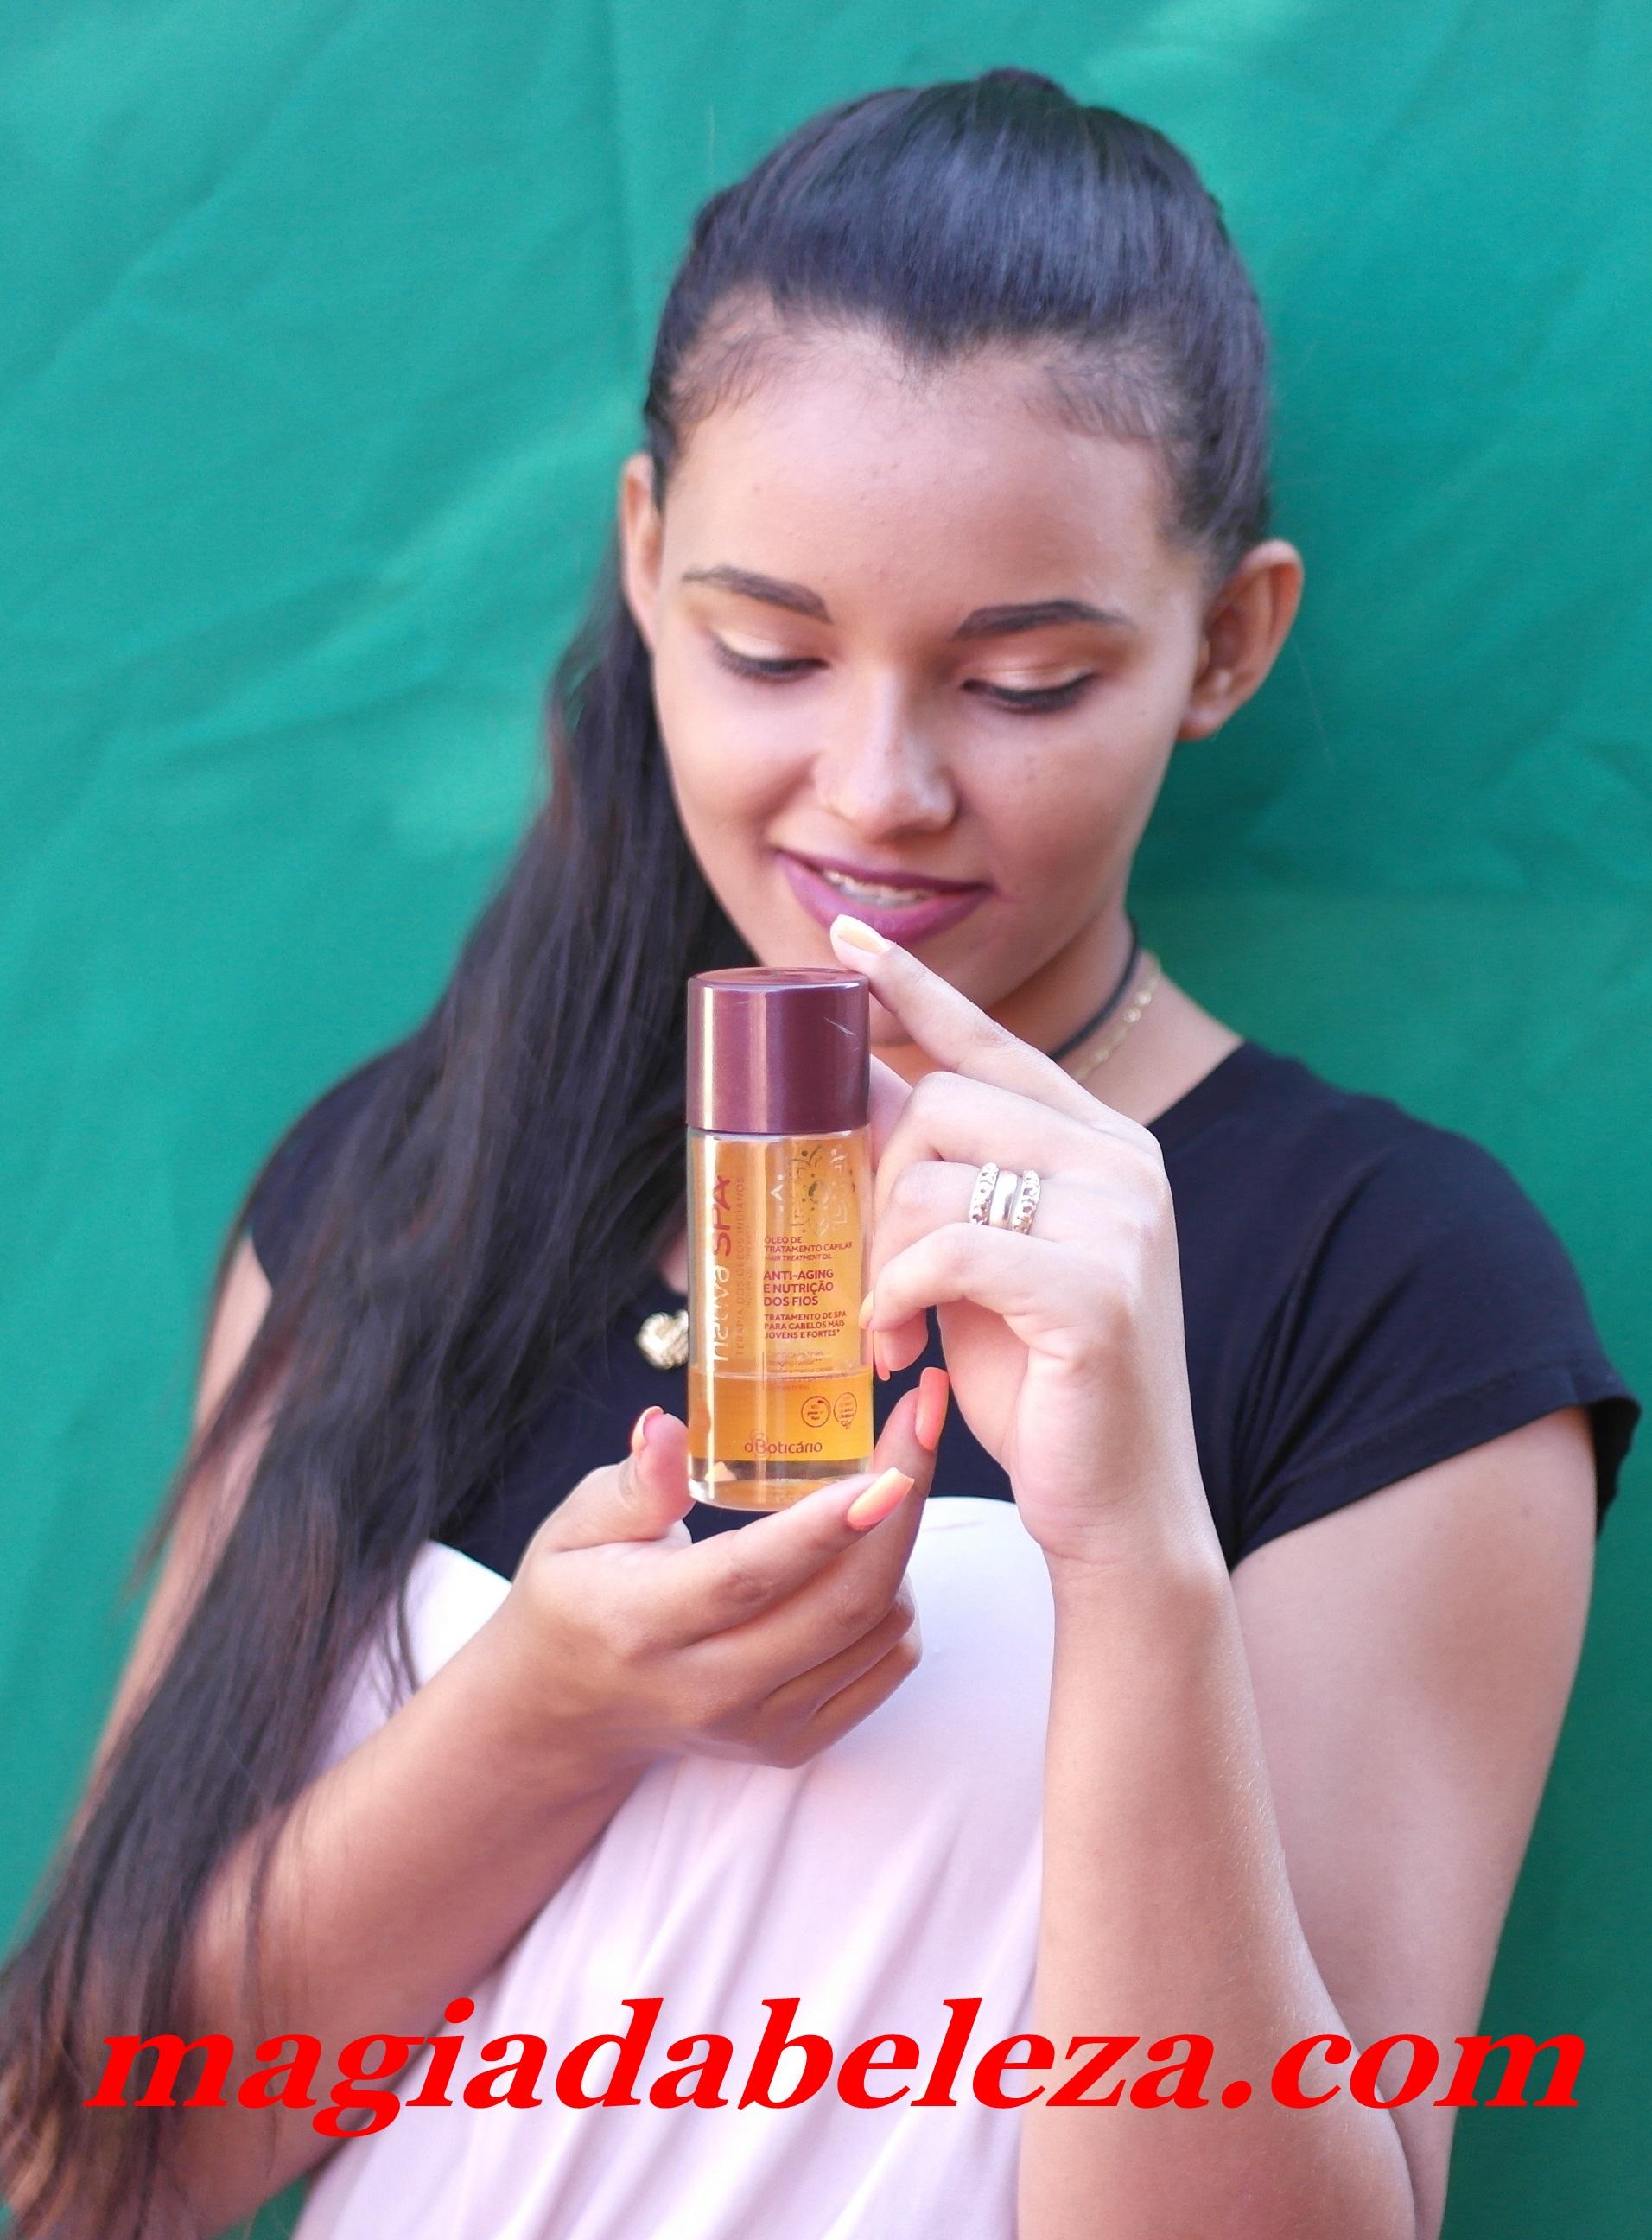 tratamento dos óleos indianos nativa spa